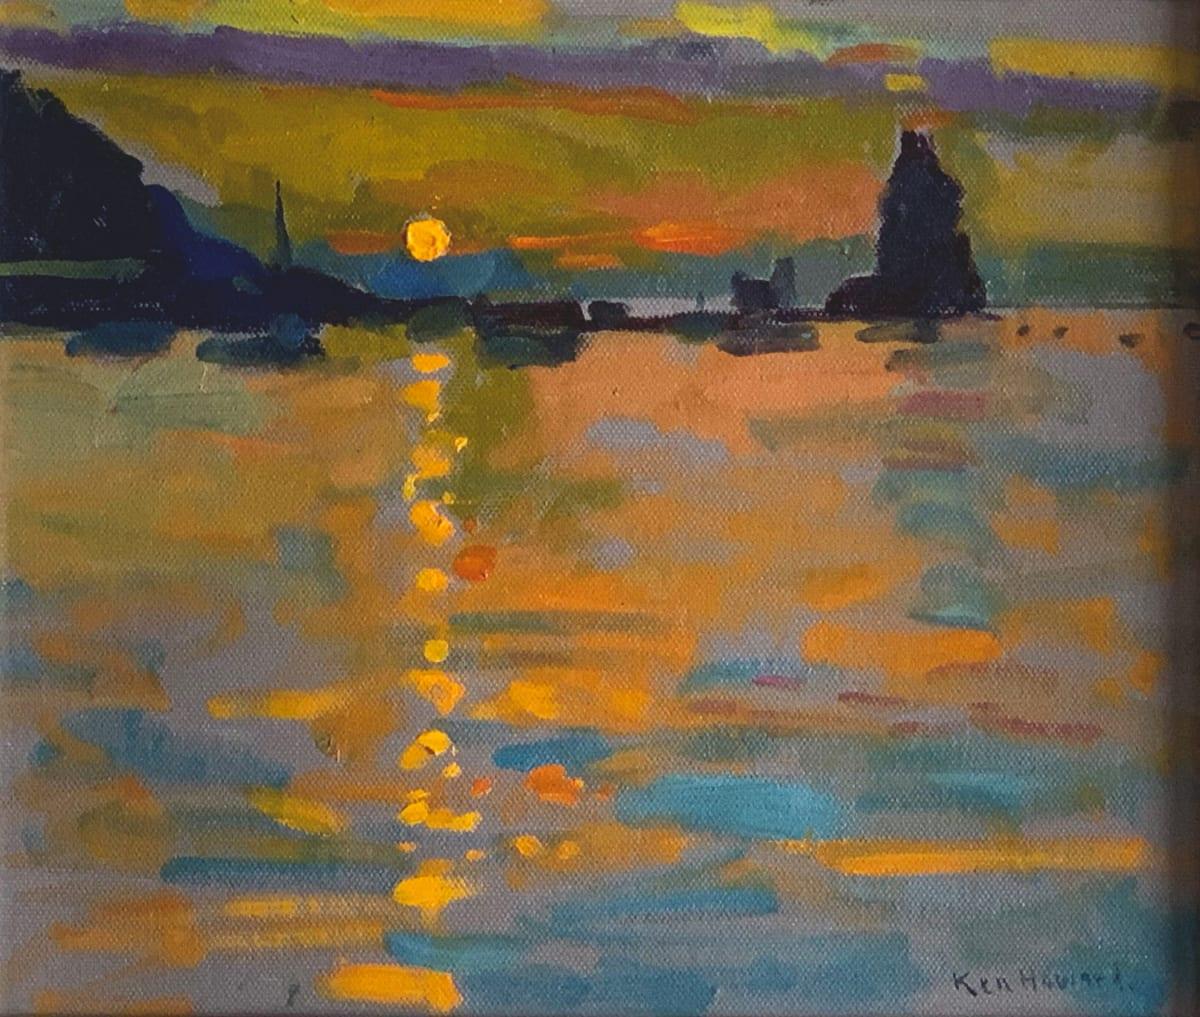 Ken Howard OBE RA, Sunset II, Volcano, 2009